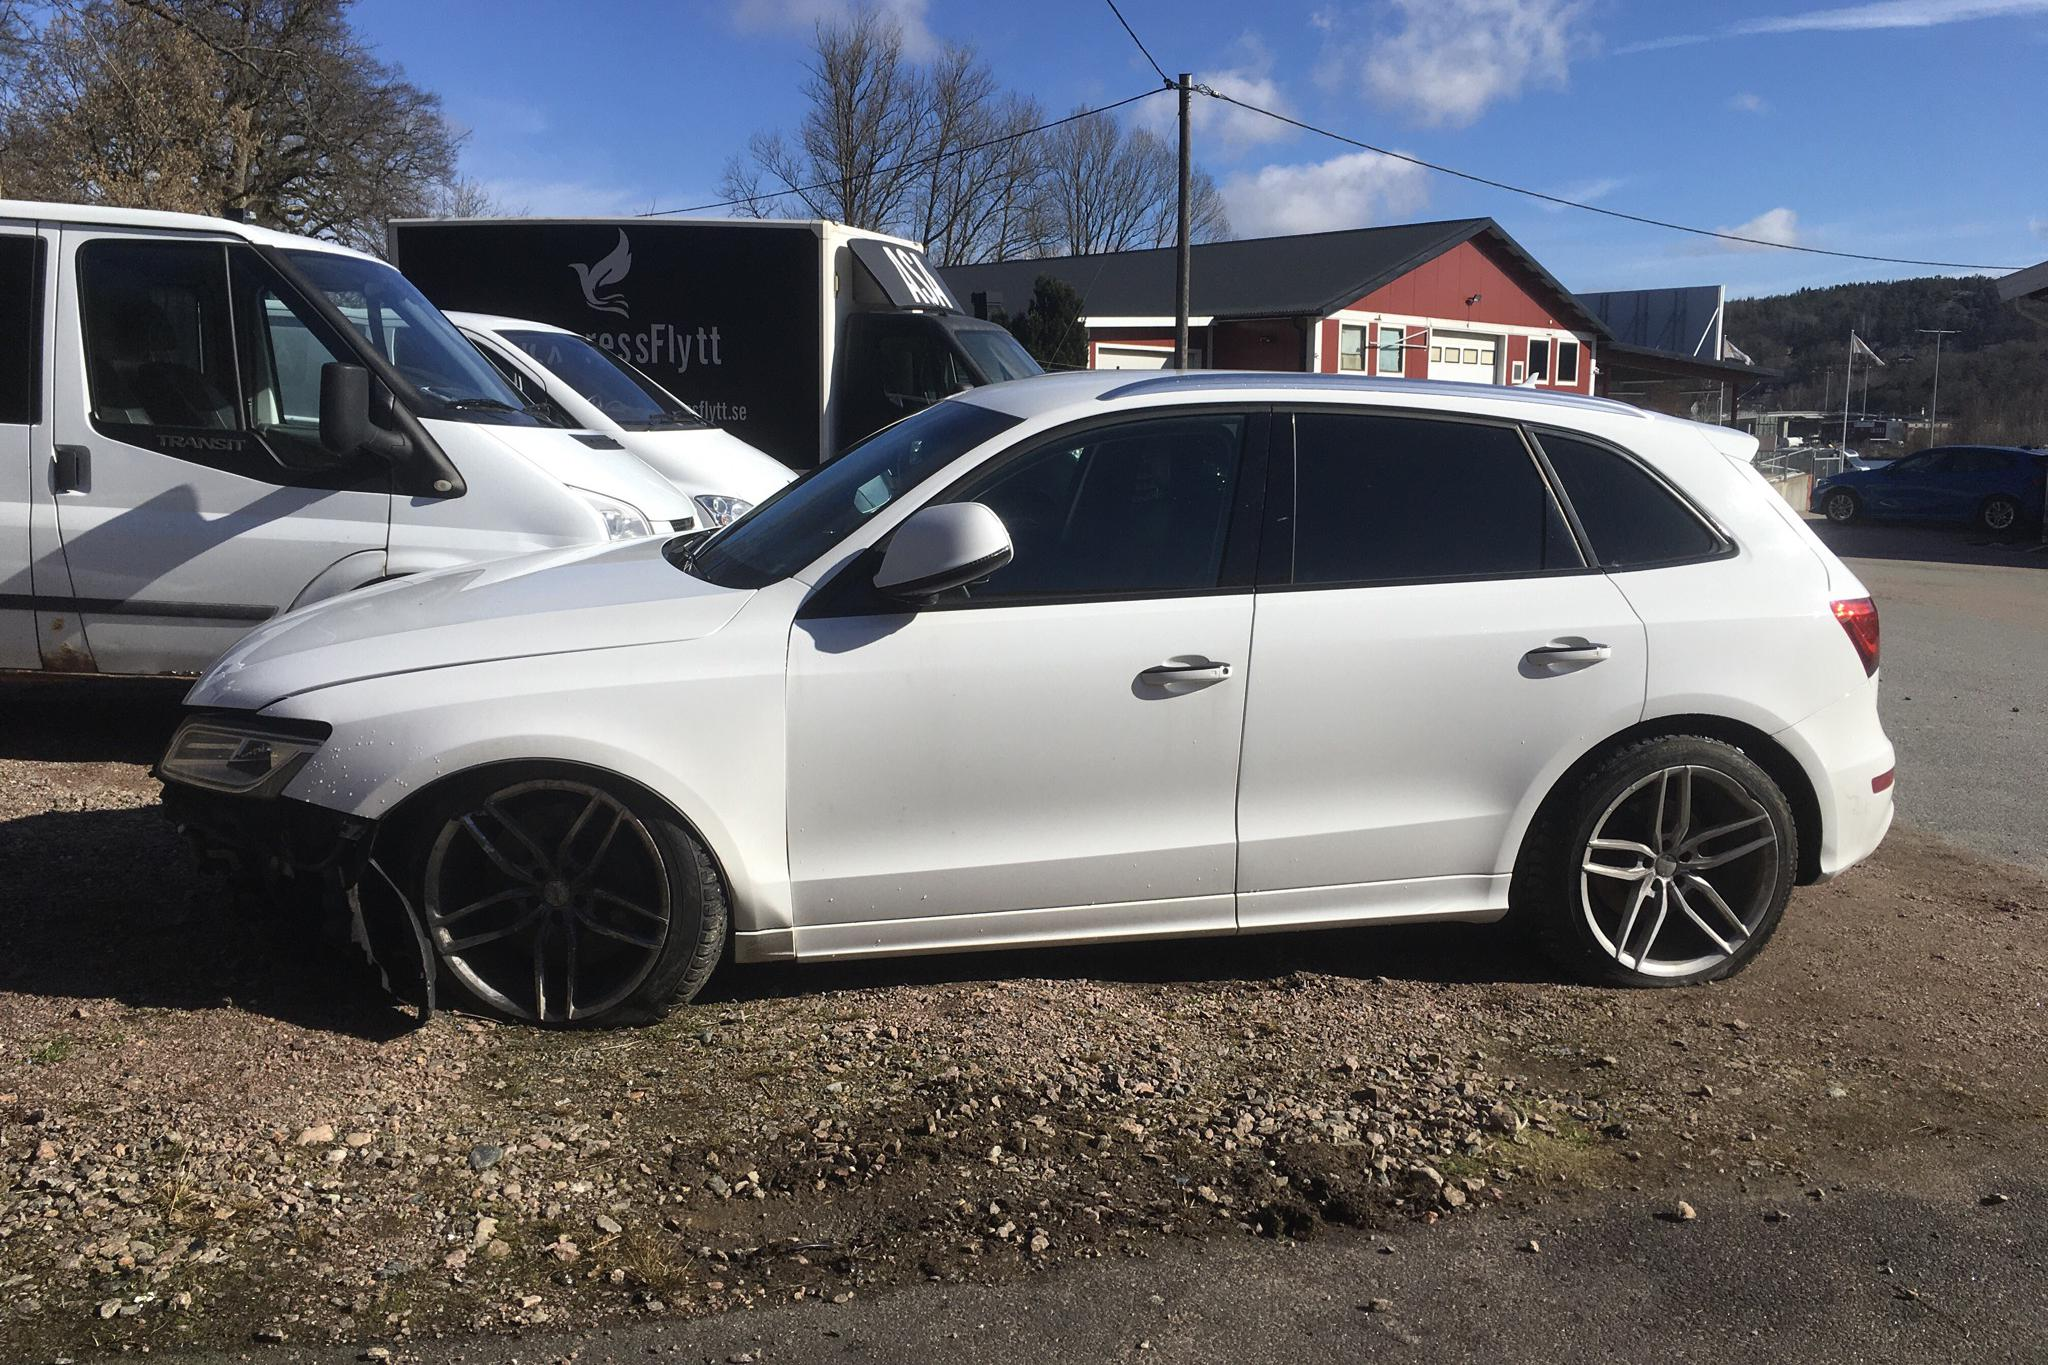 Audi SQ5 3.0 TDI quattro (313hk) - 129 000 km - Automatic - white - 2015